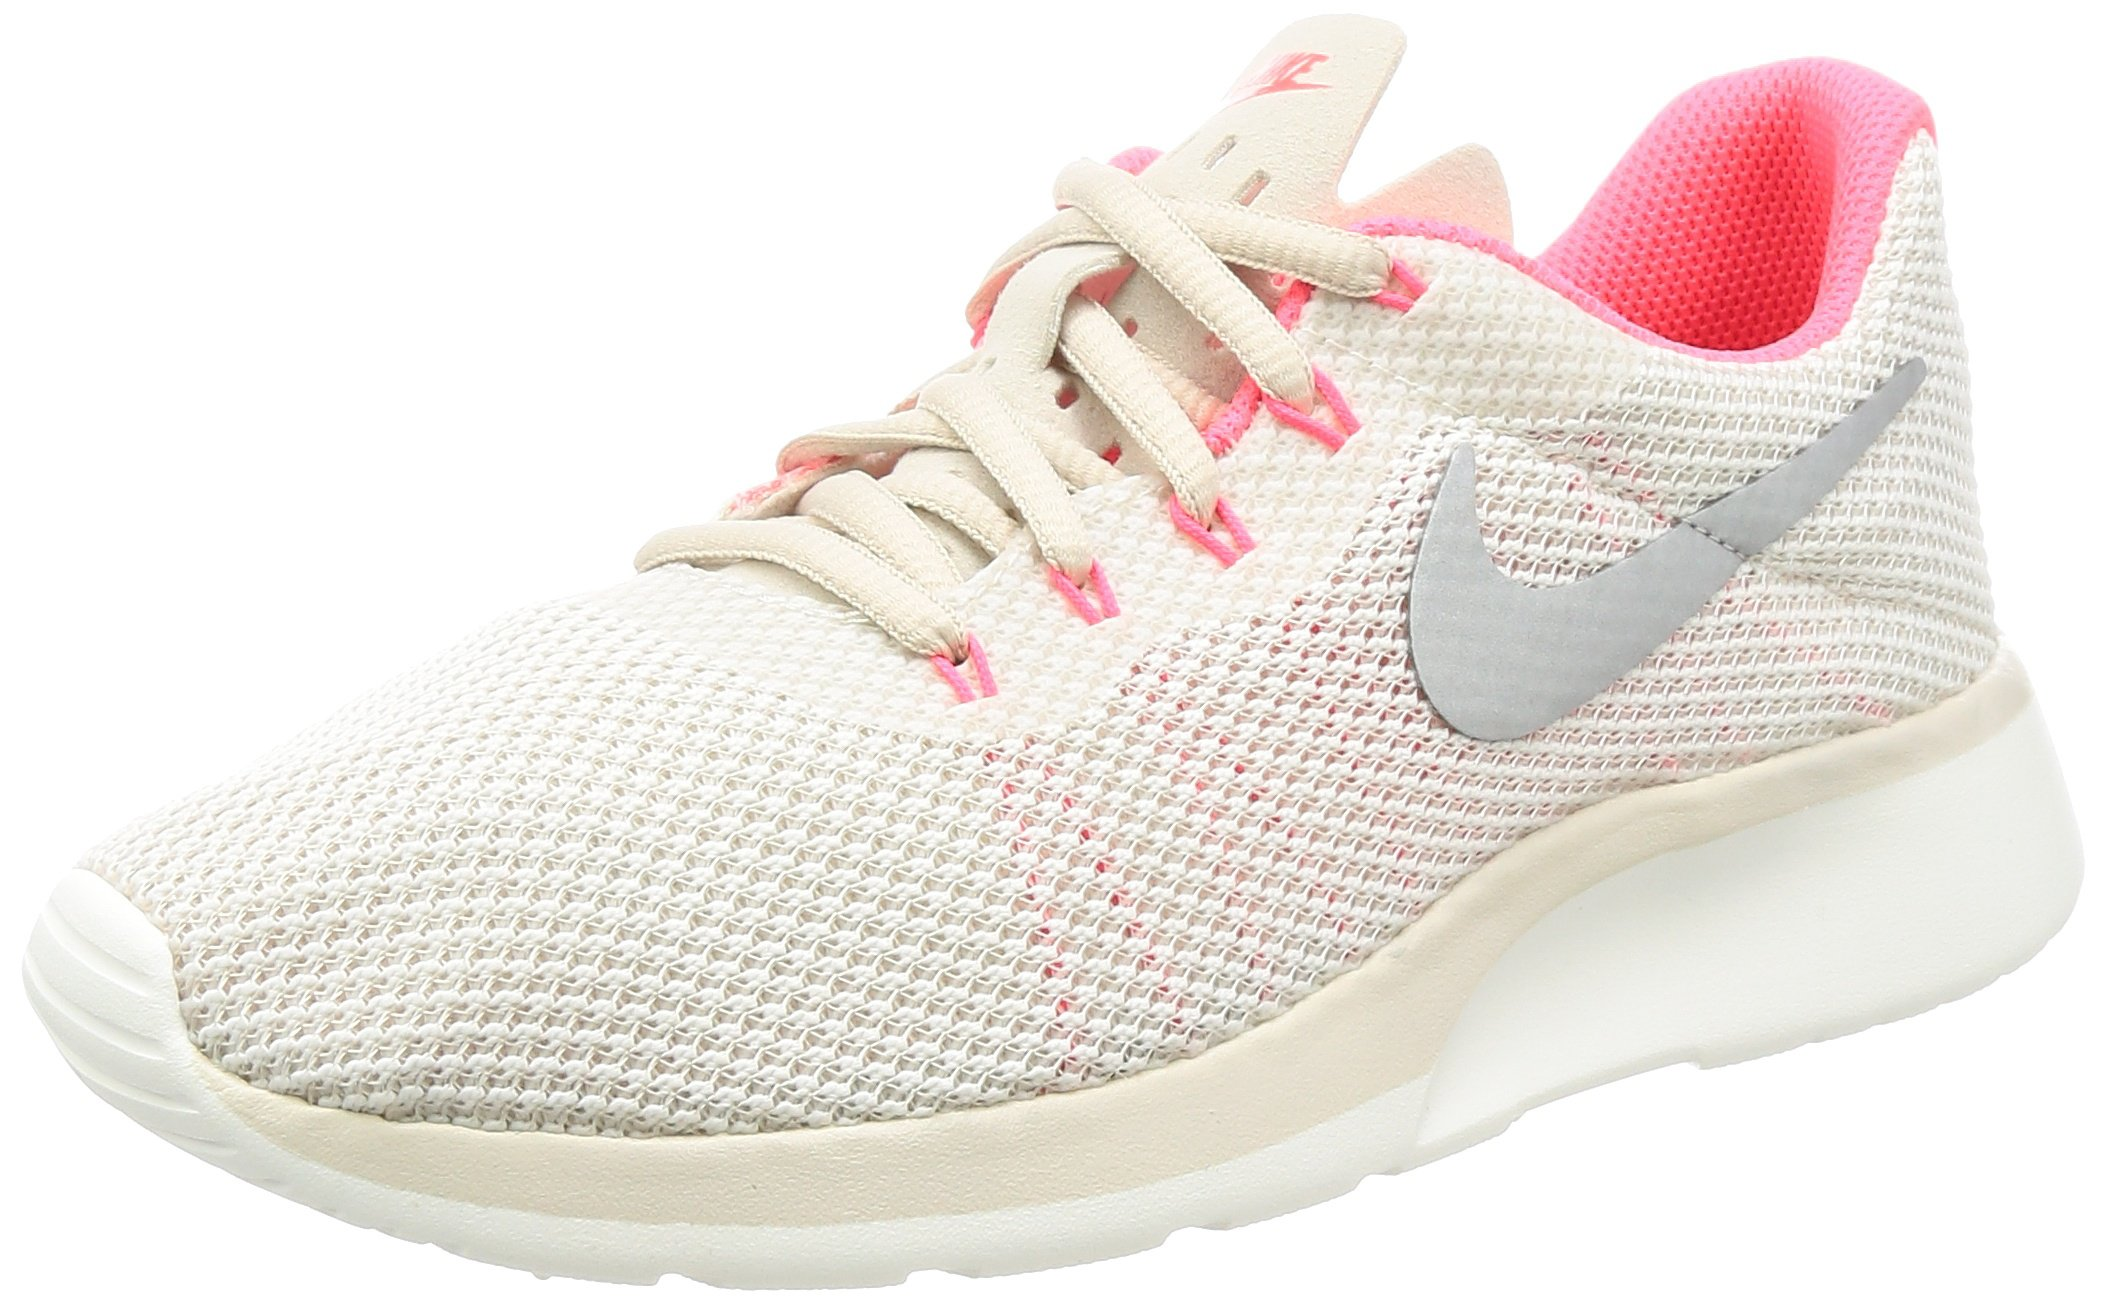 Nike Women's Tanjun Racer Running Shoe LT Orewood Brn/Chrom-Sail-Solar Red 8.5